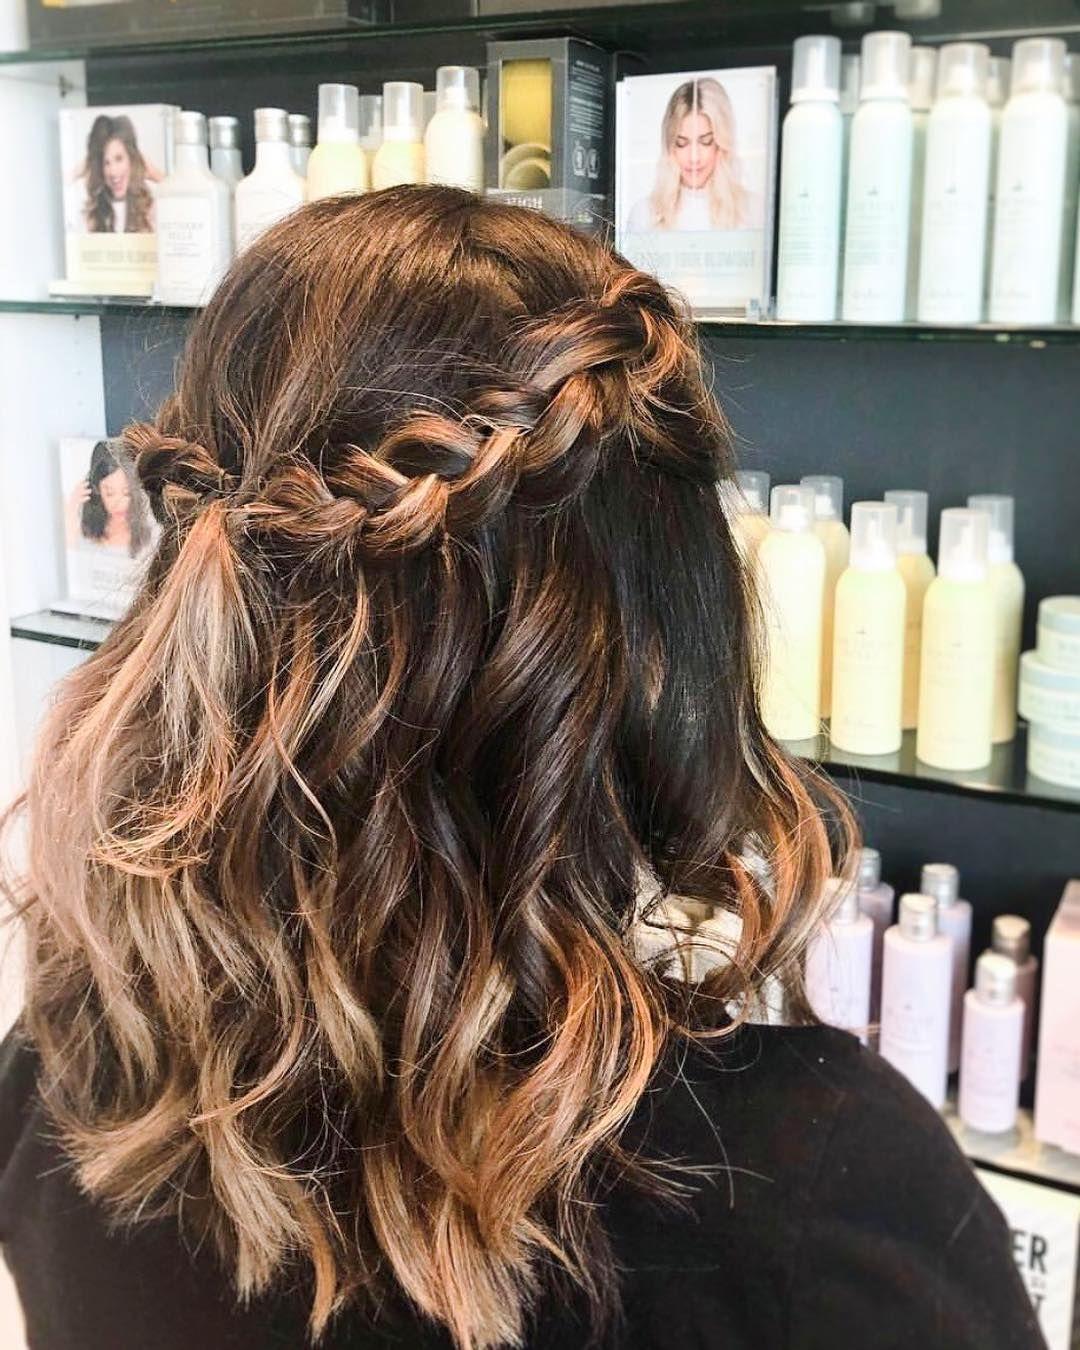 obsessing over this braided festival look | hair. | hair